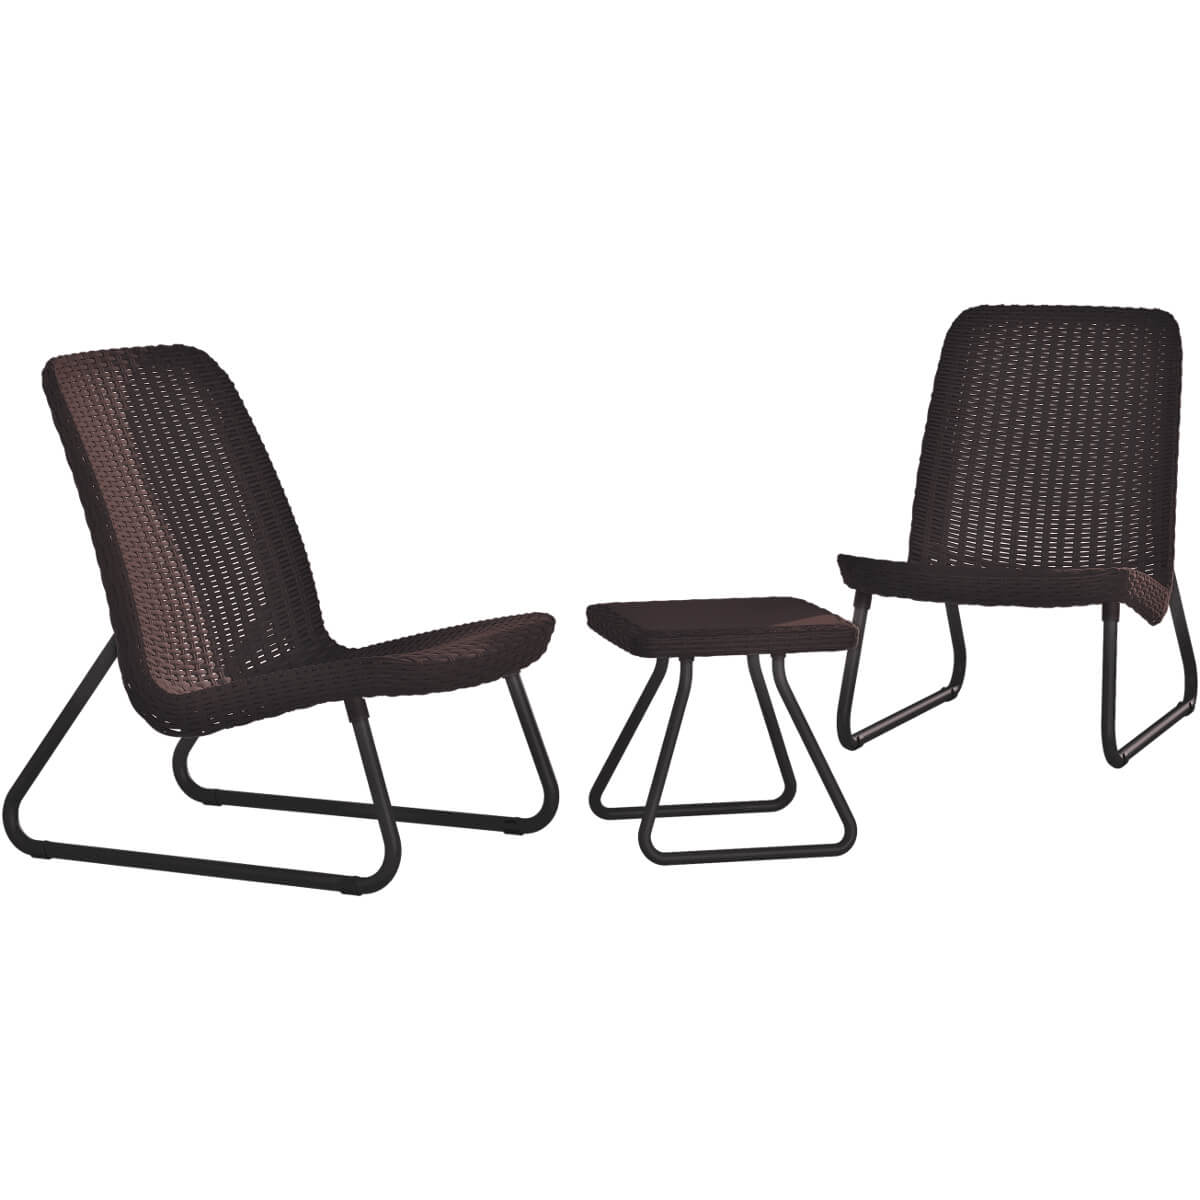 Комплект мебели Keter Rio Patio 17197637